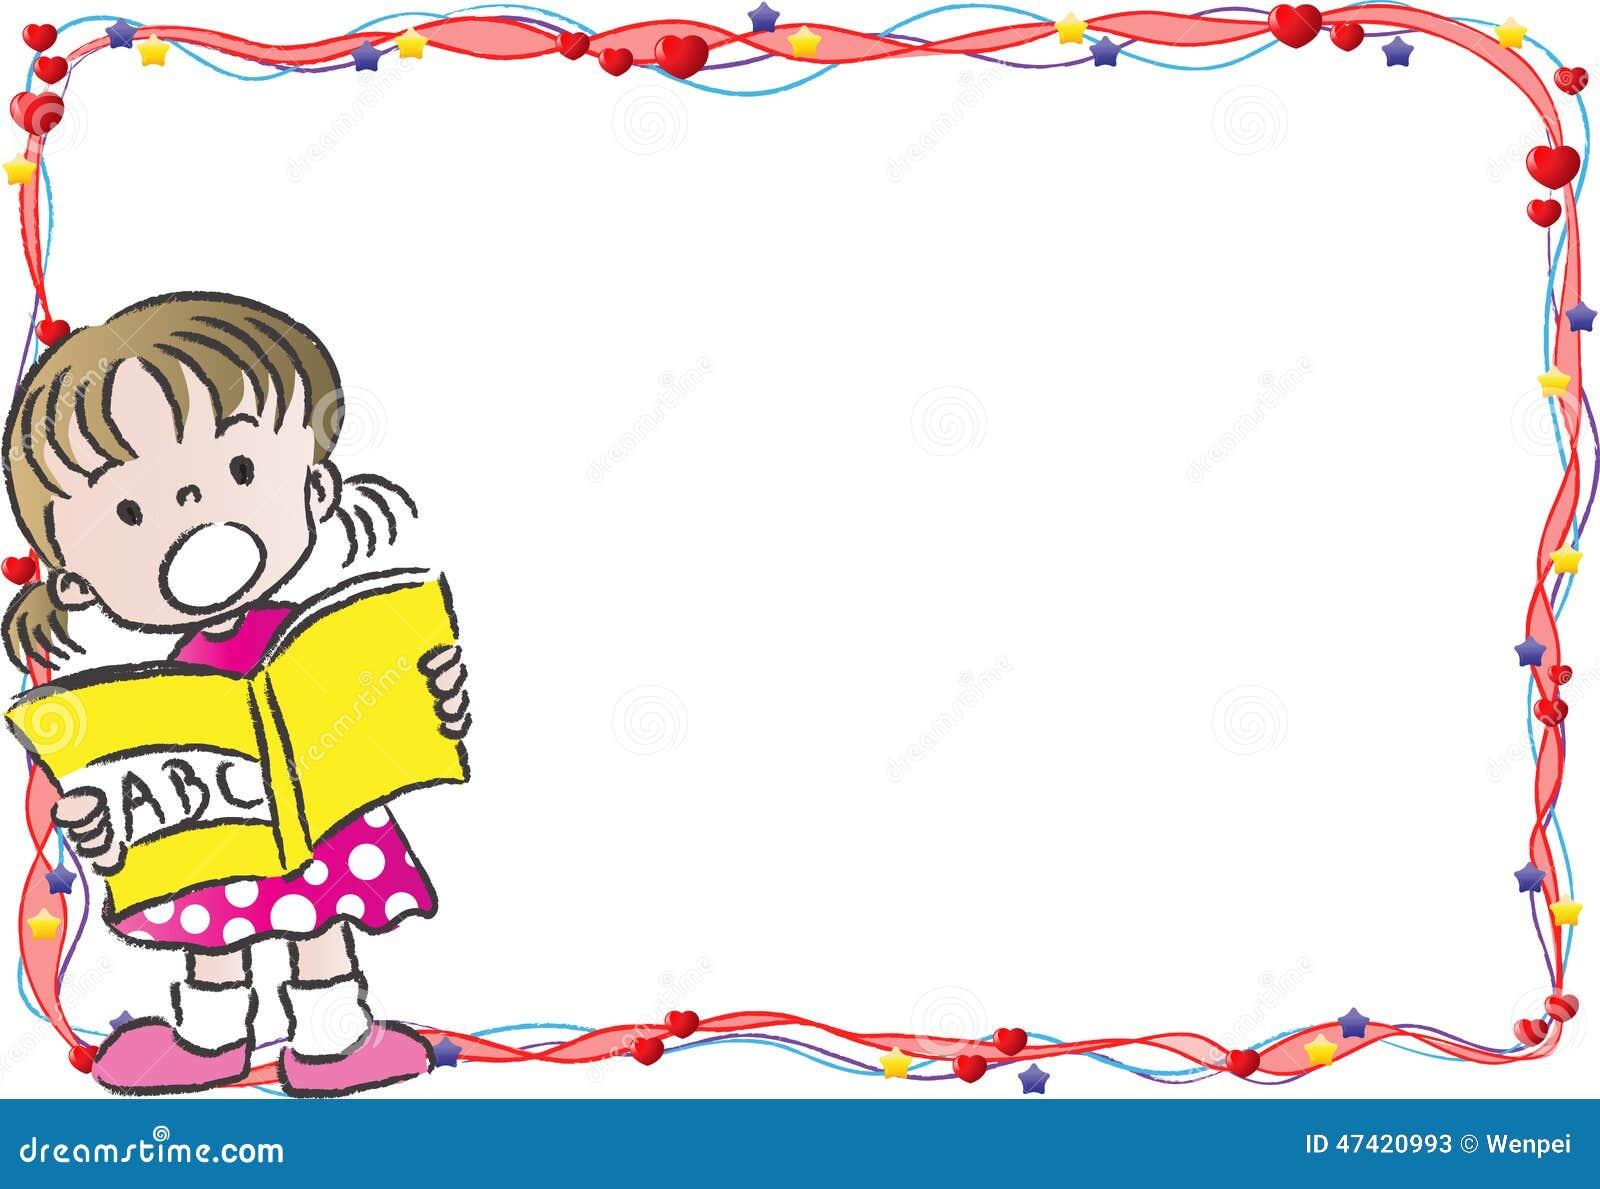 Card border frame stock illustration. Illustration of ...